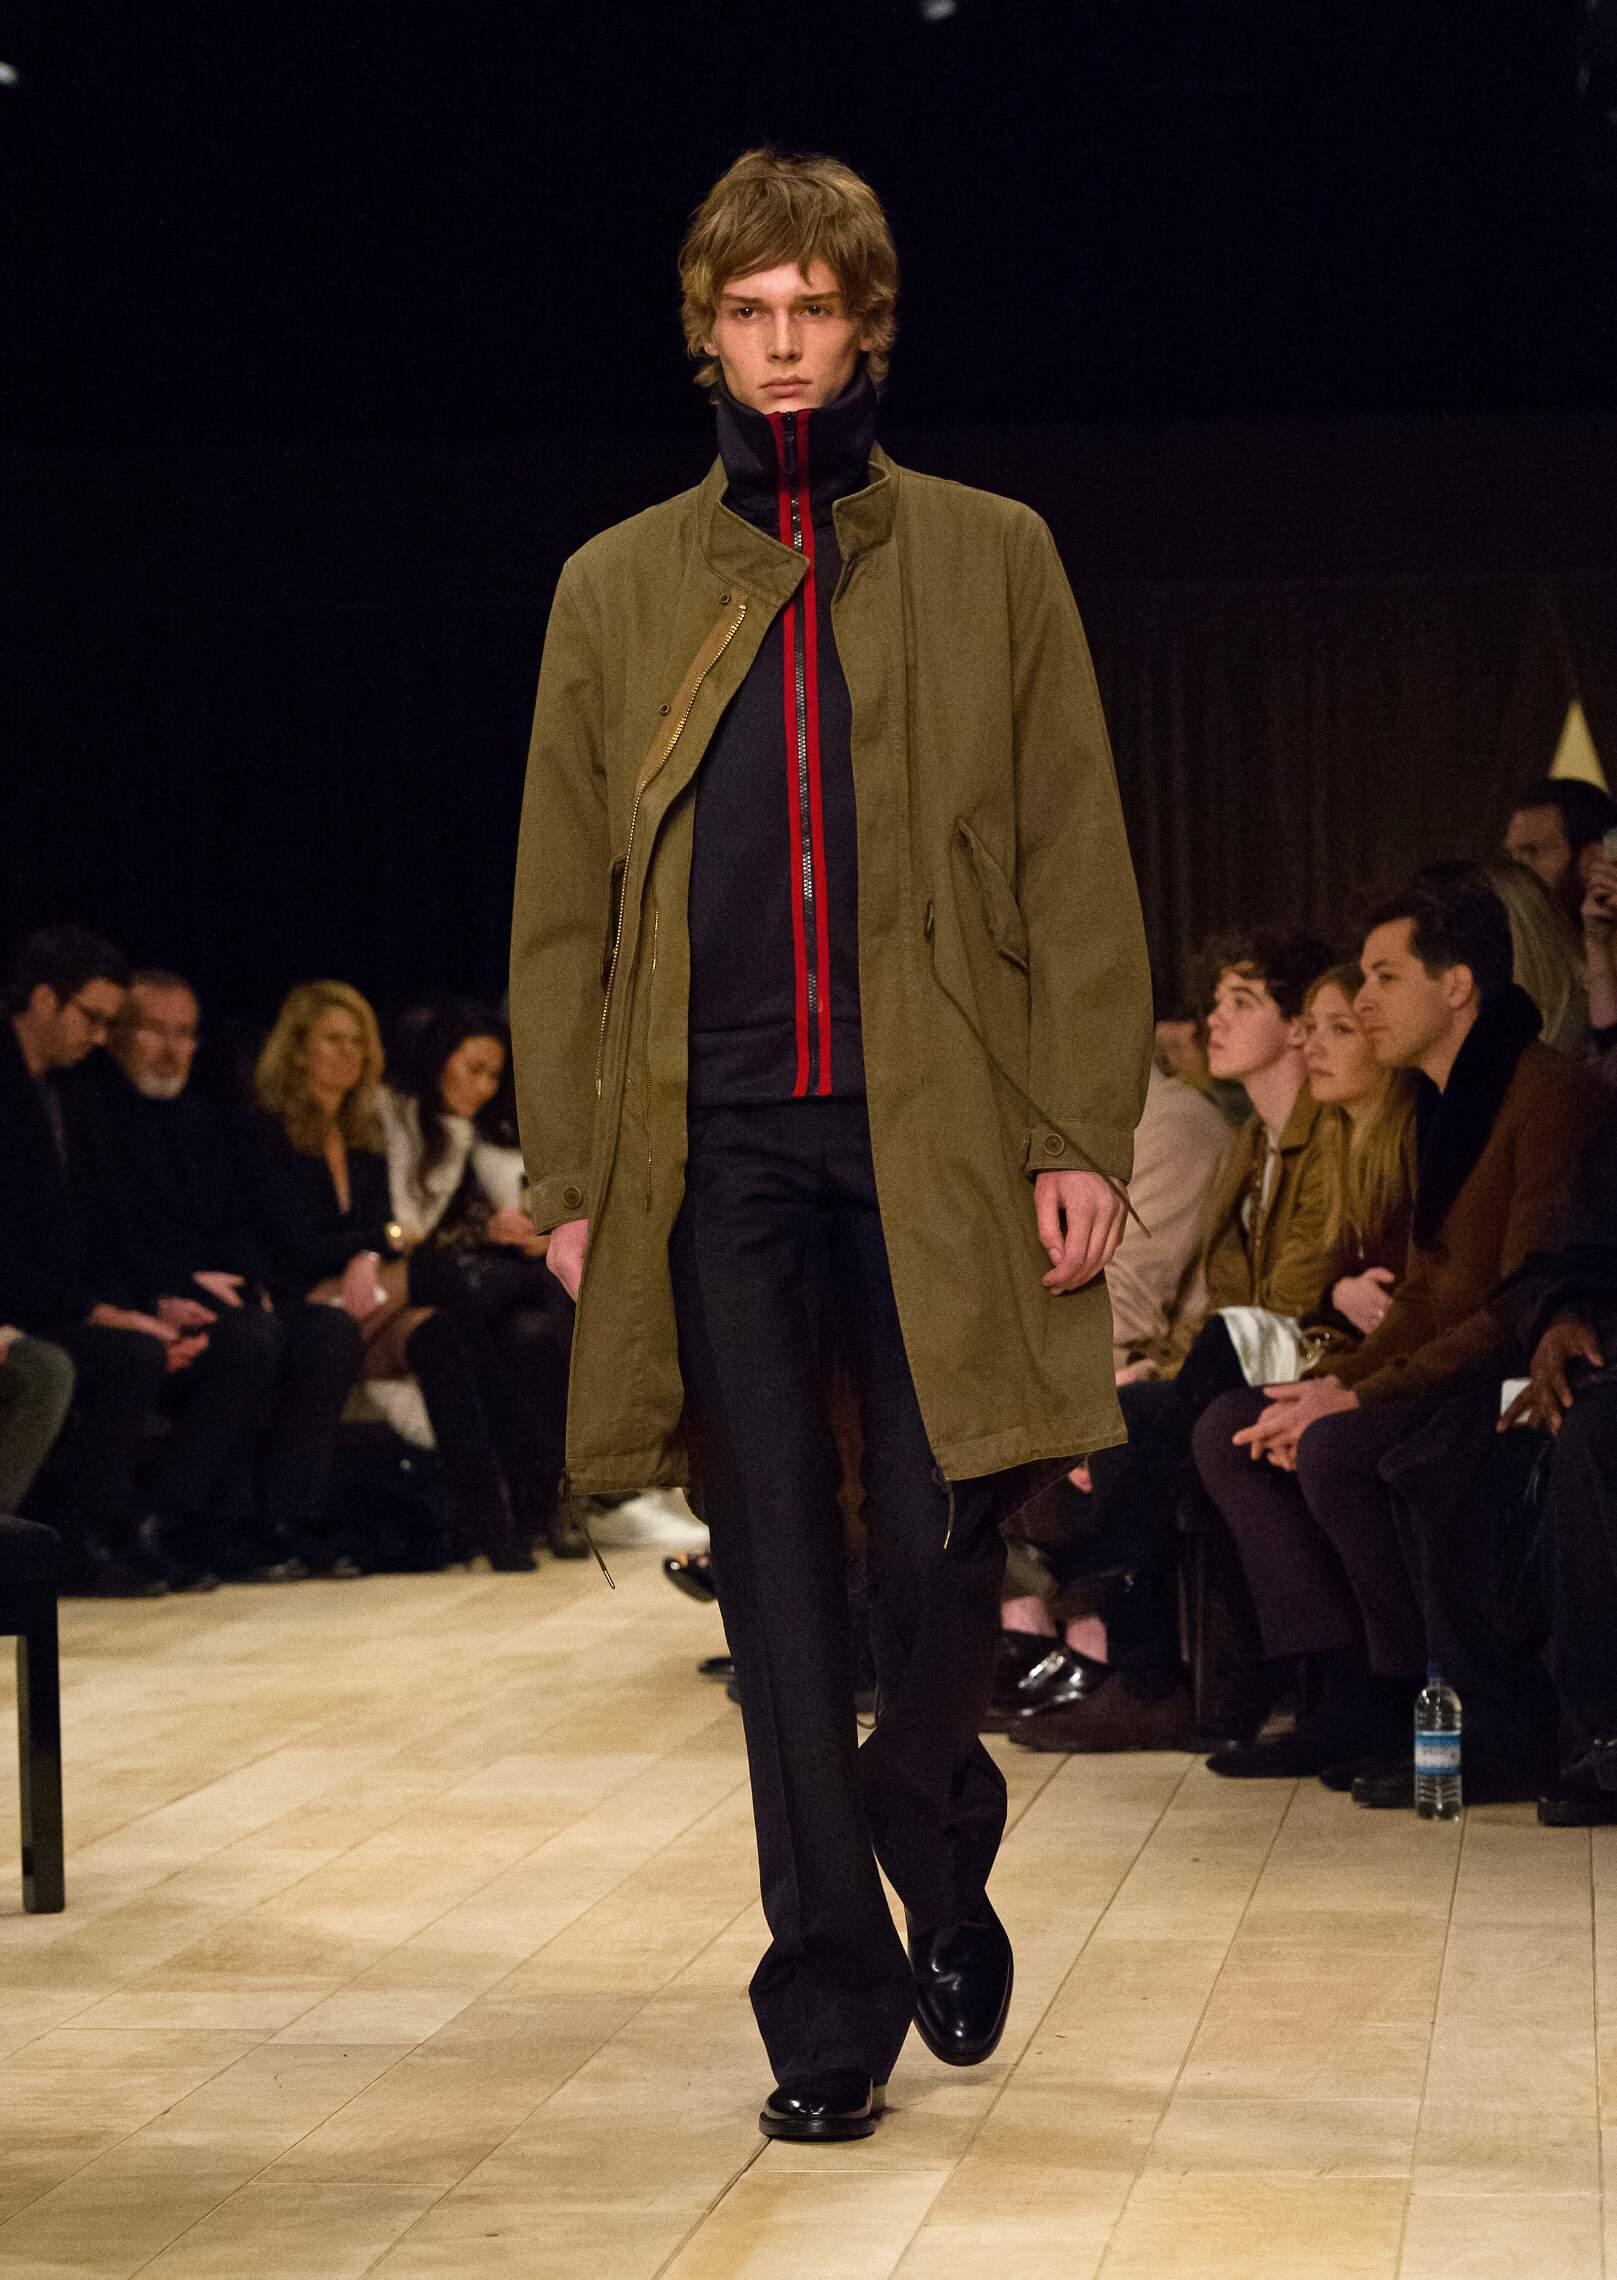 Fashion Model Burberry Catwalk